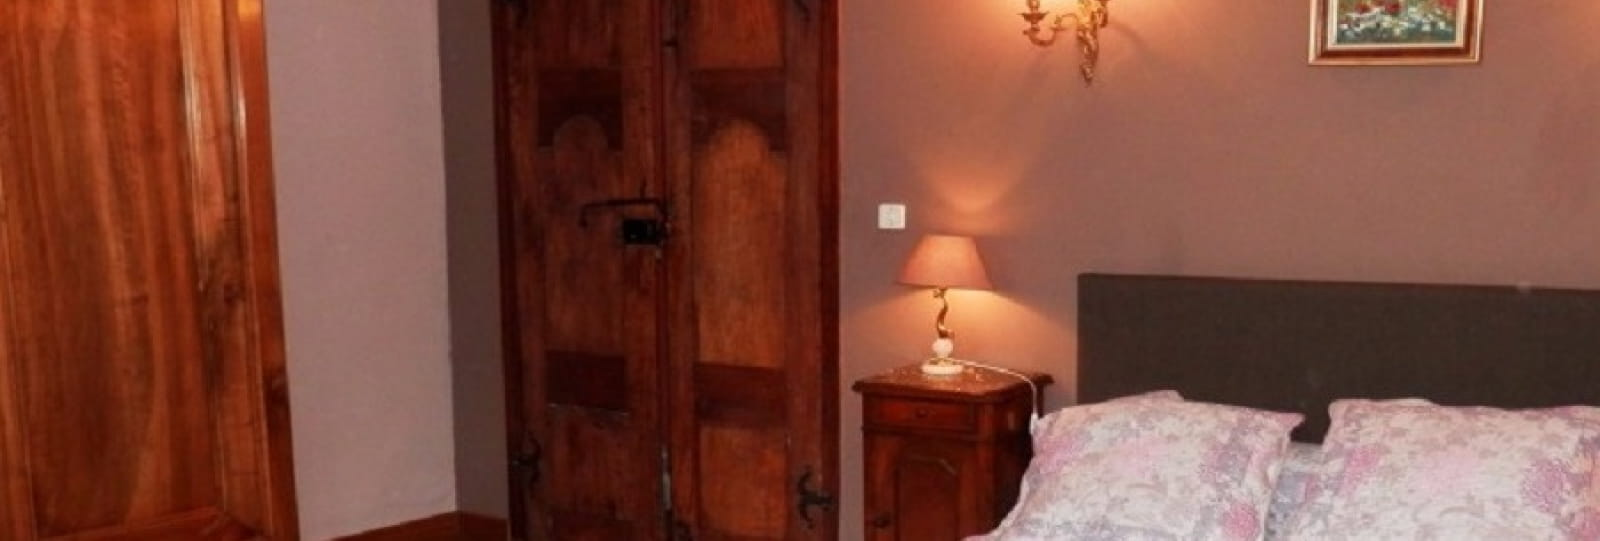 Hotel Particulier Payan Champier